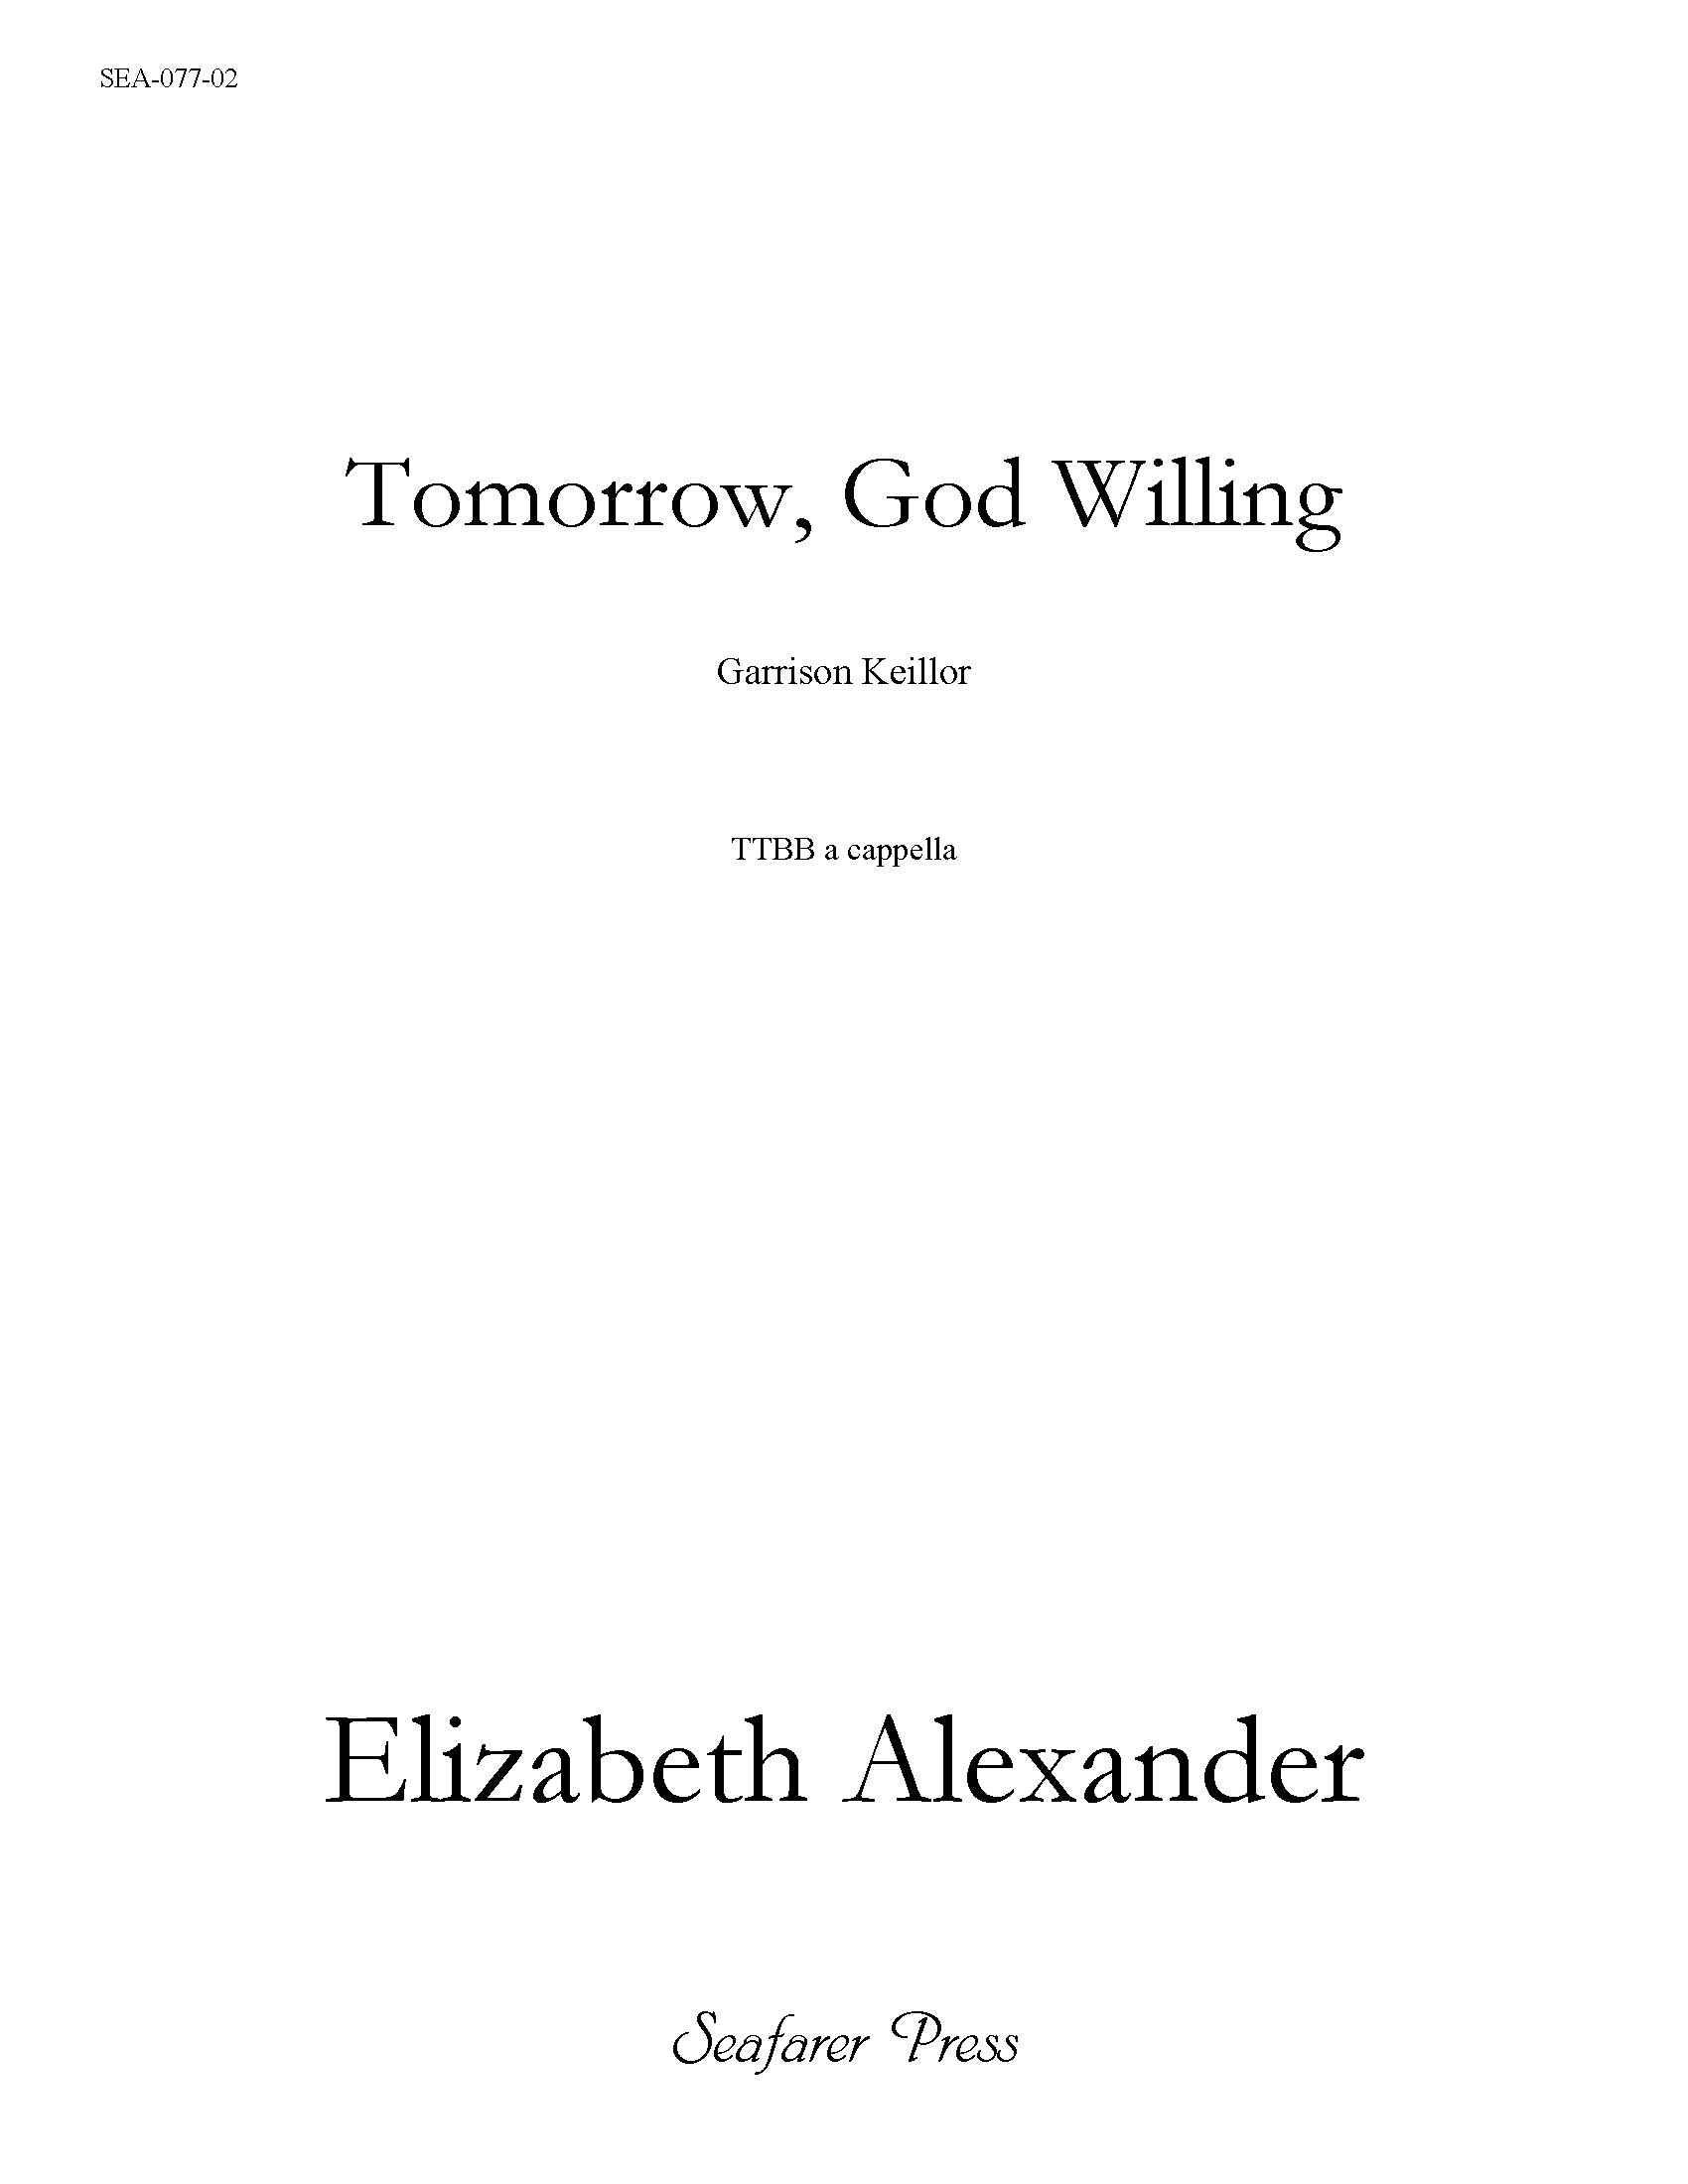 SEA-077-02 - Tomorrow, God Willing